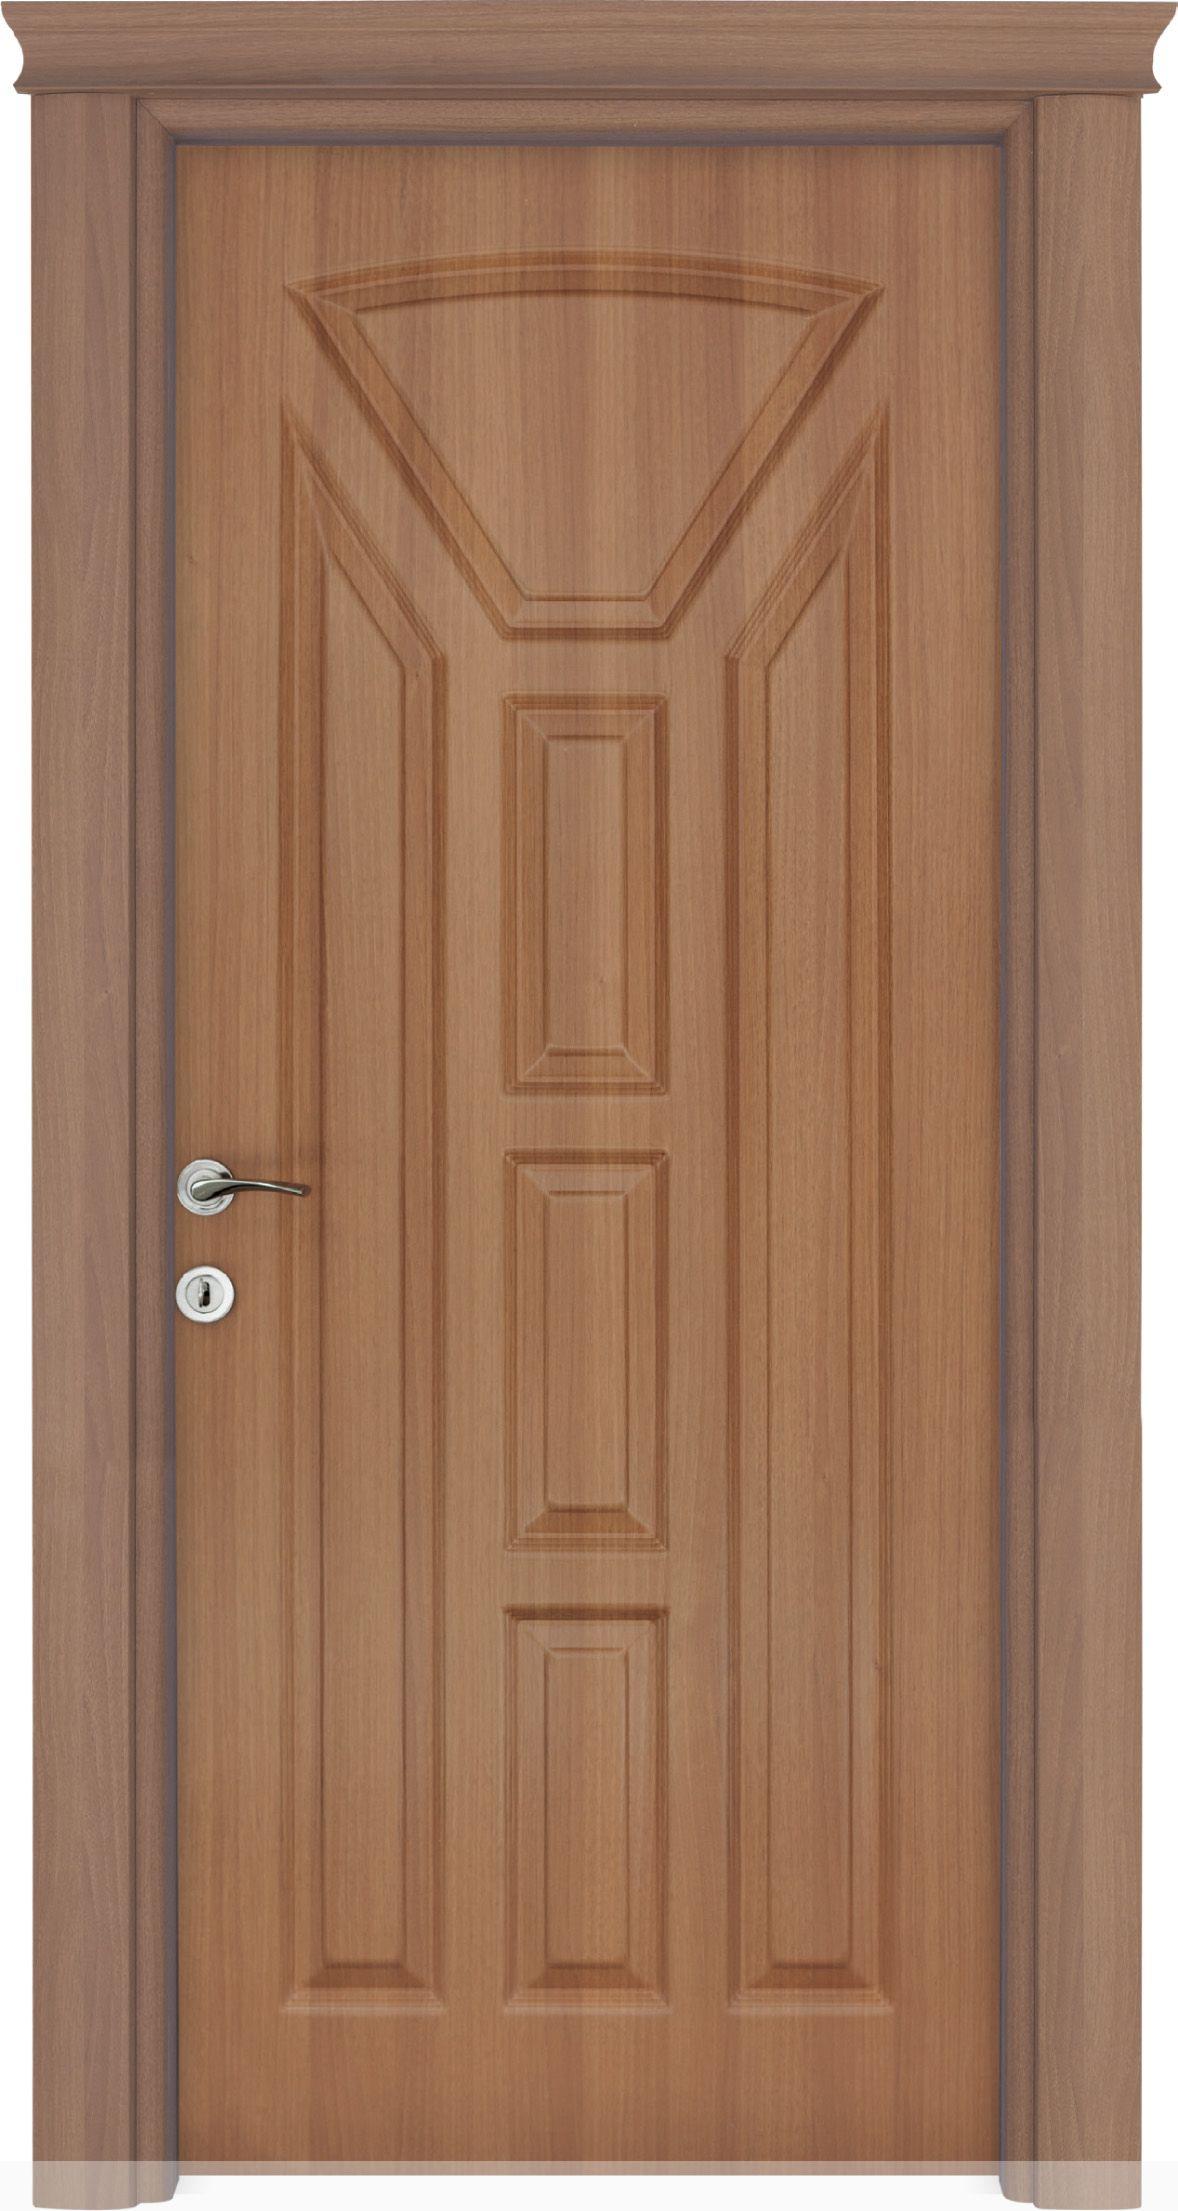 ... Turkey ... & URAS PLASTİK SAN VE TİC.LTD.ŞTİ. - PVC Doors - ACRODOOR With ...